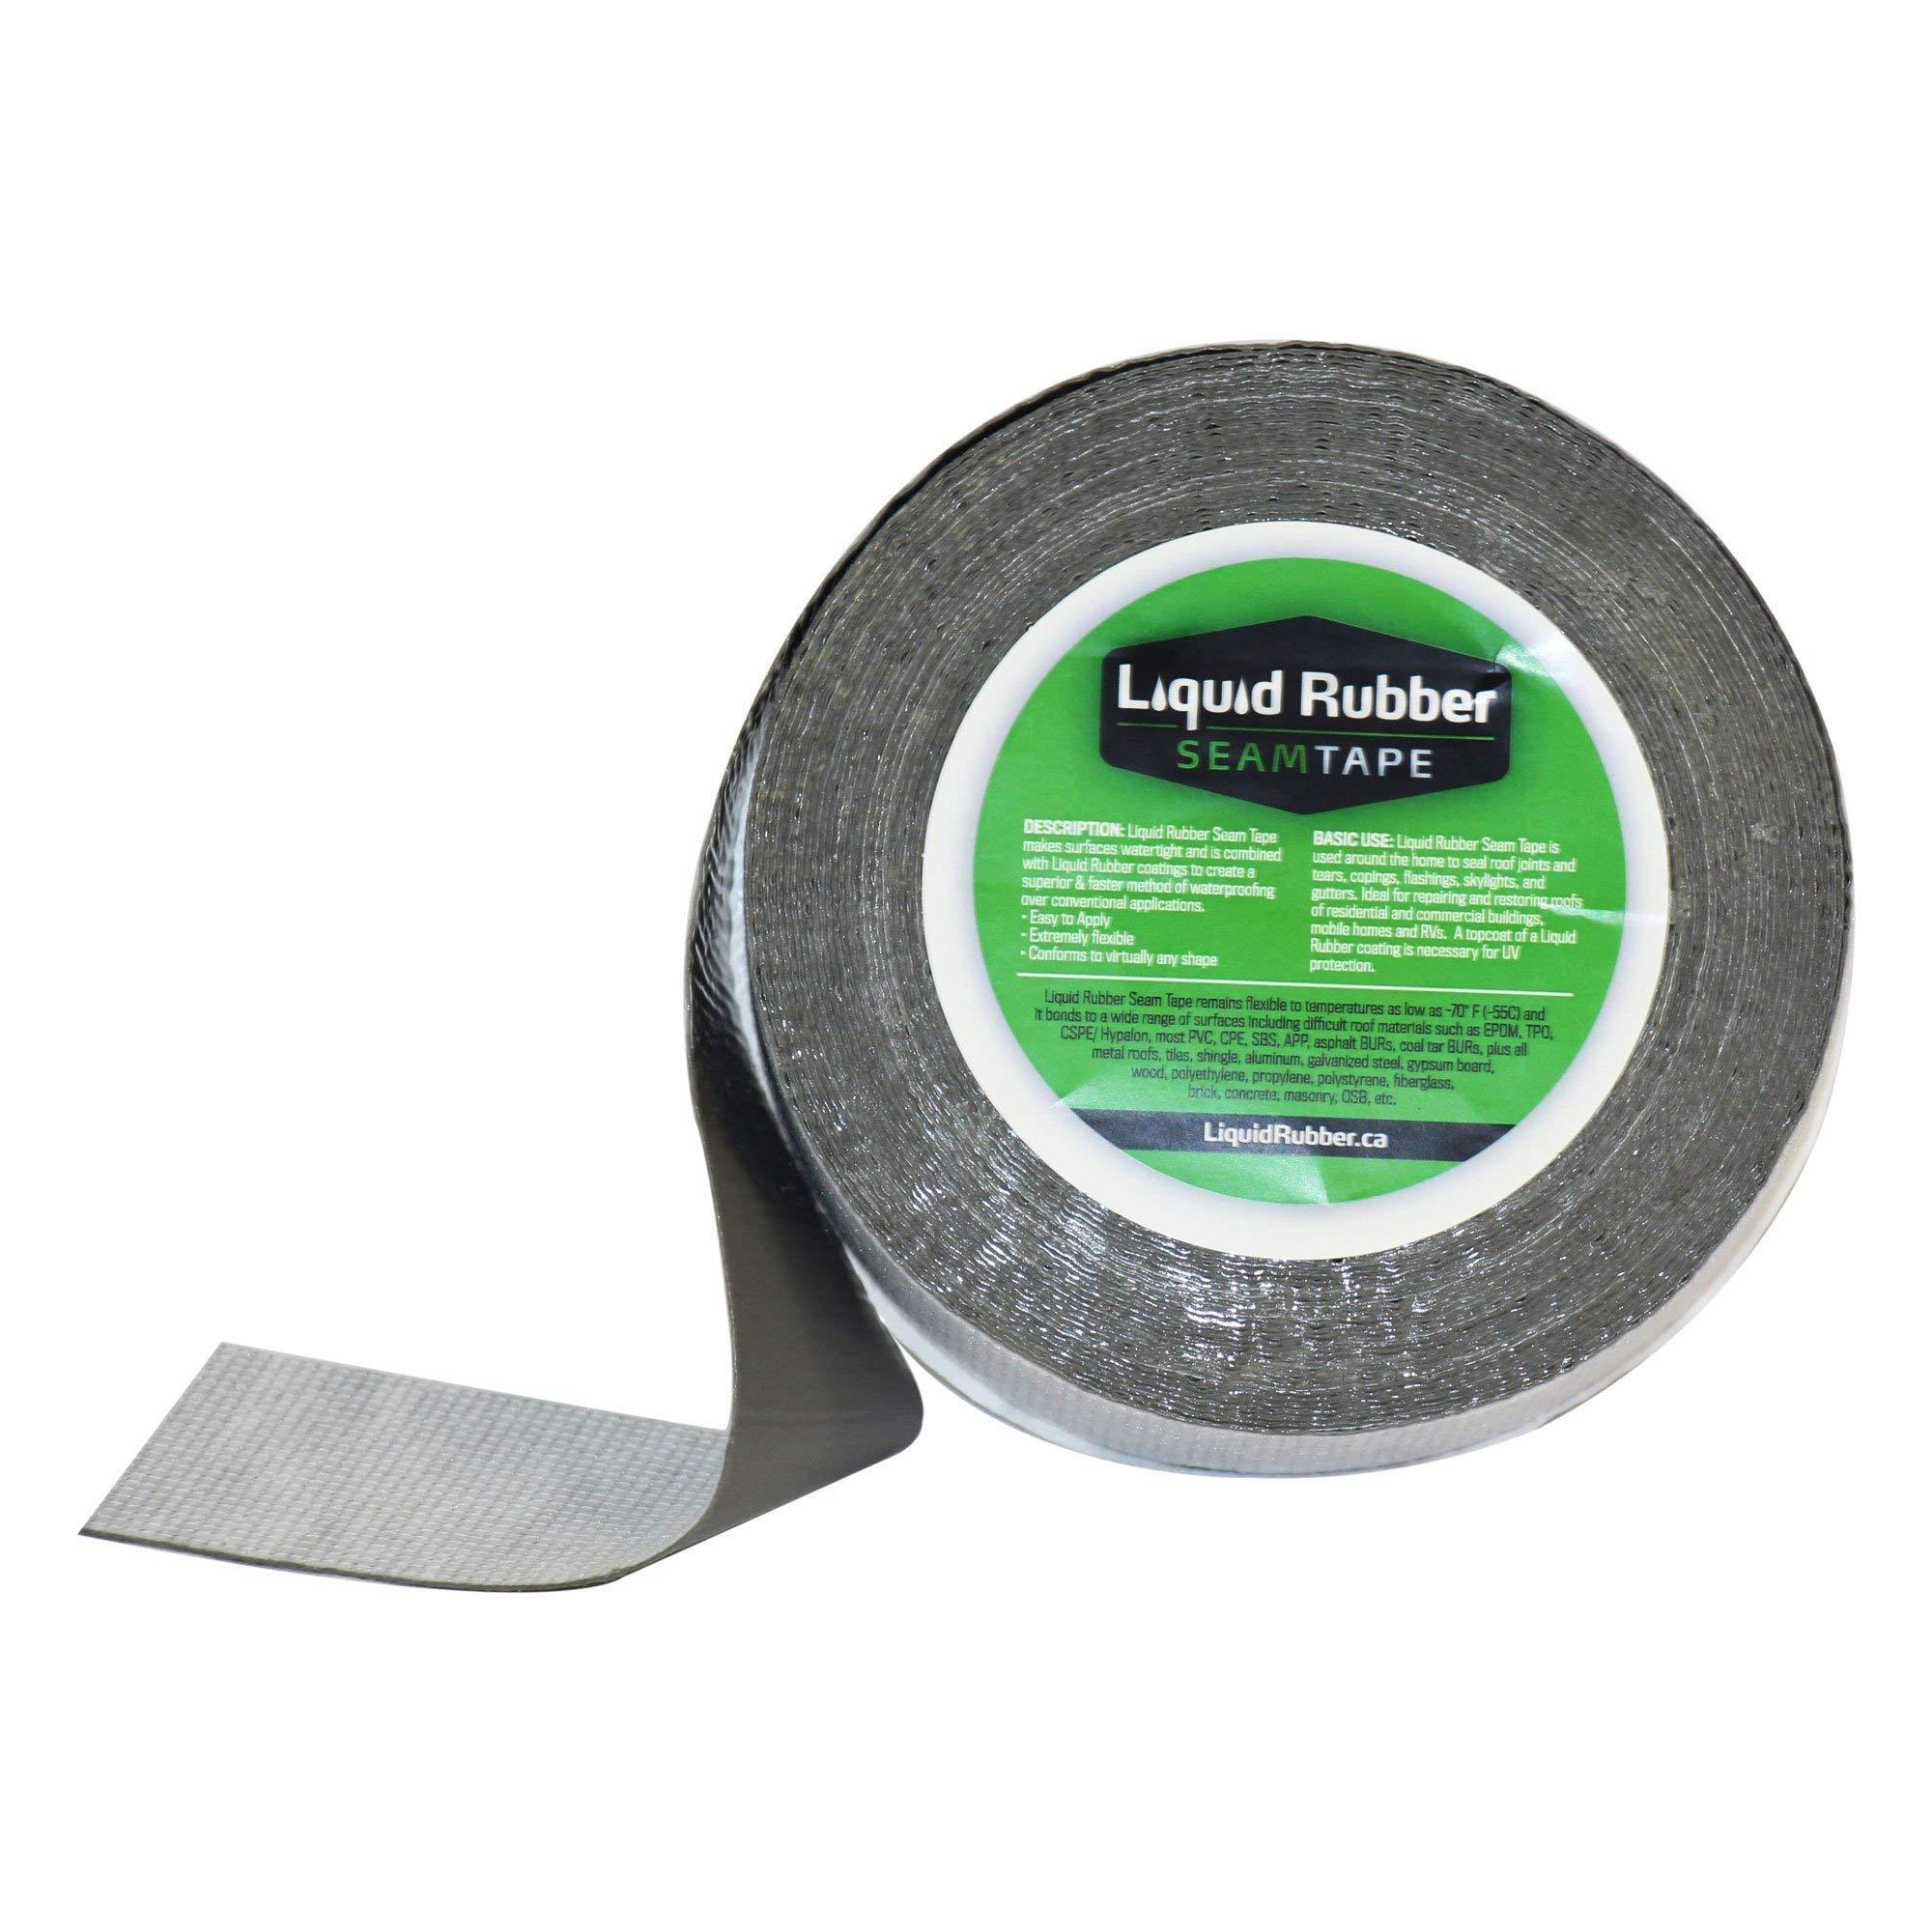 Liquid Rubber Seam Leak Tape, 2 Inch x 50 Foot Roll by L R